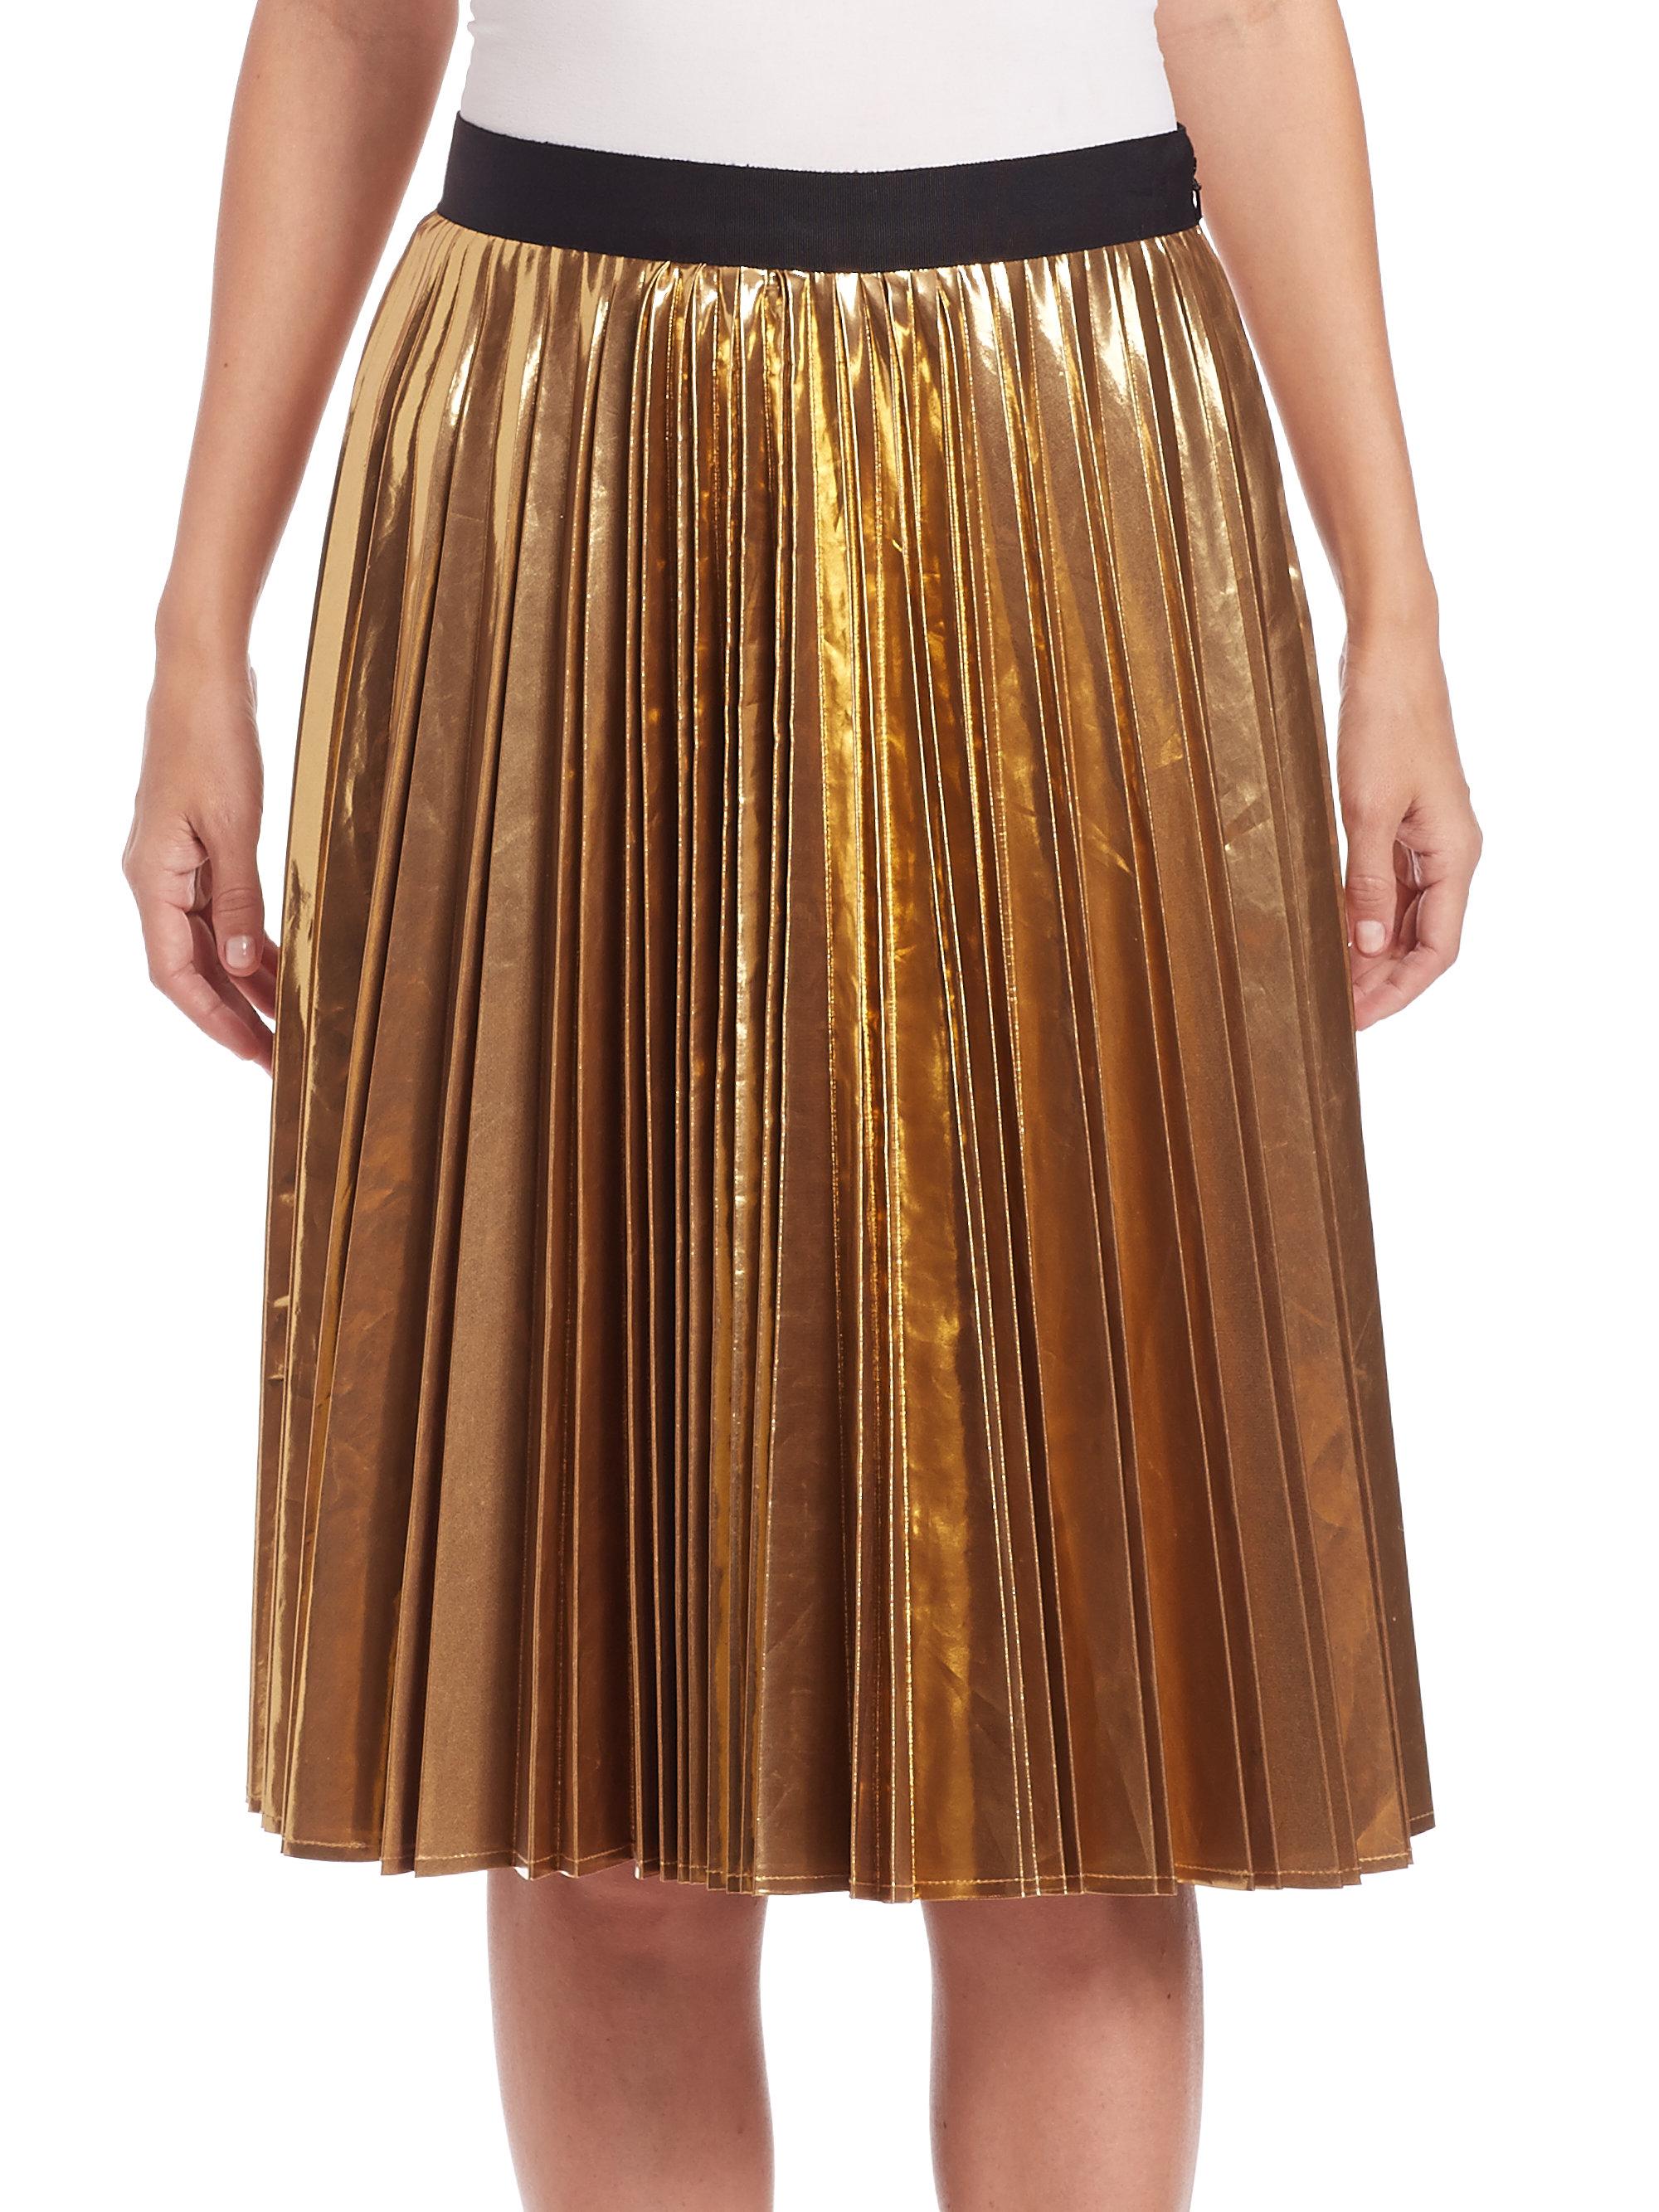 d4733fed75 DKNY Metallic Pleated Skirt in Metallic - Lyst